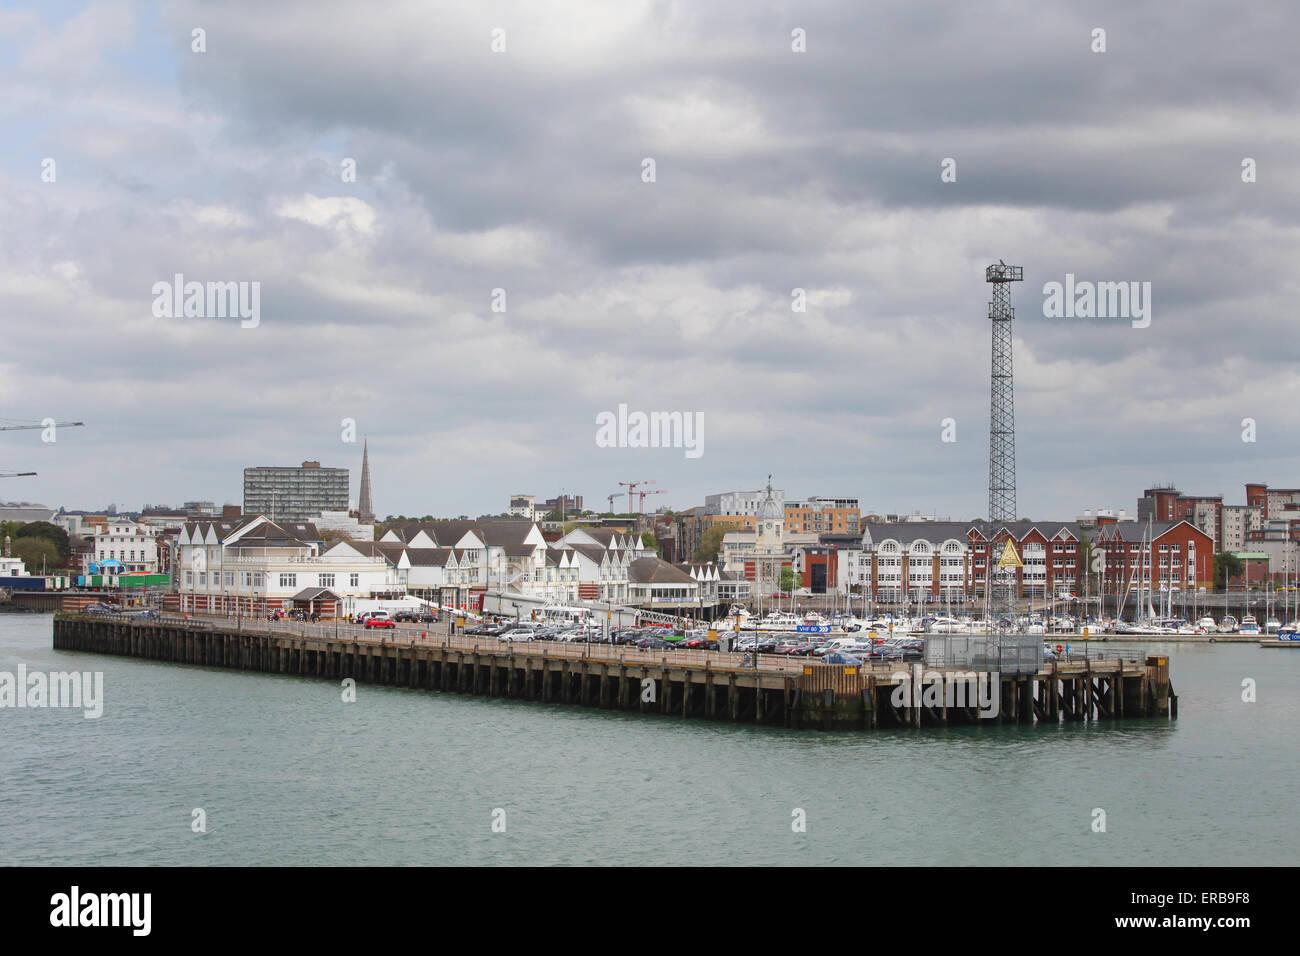 Town Quay marina in Southampton, Hampshire UK - Stock Image